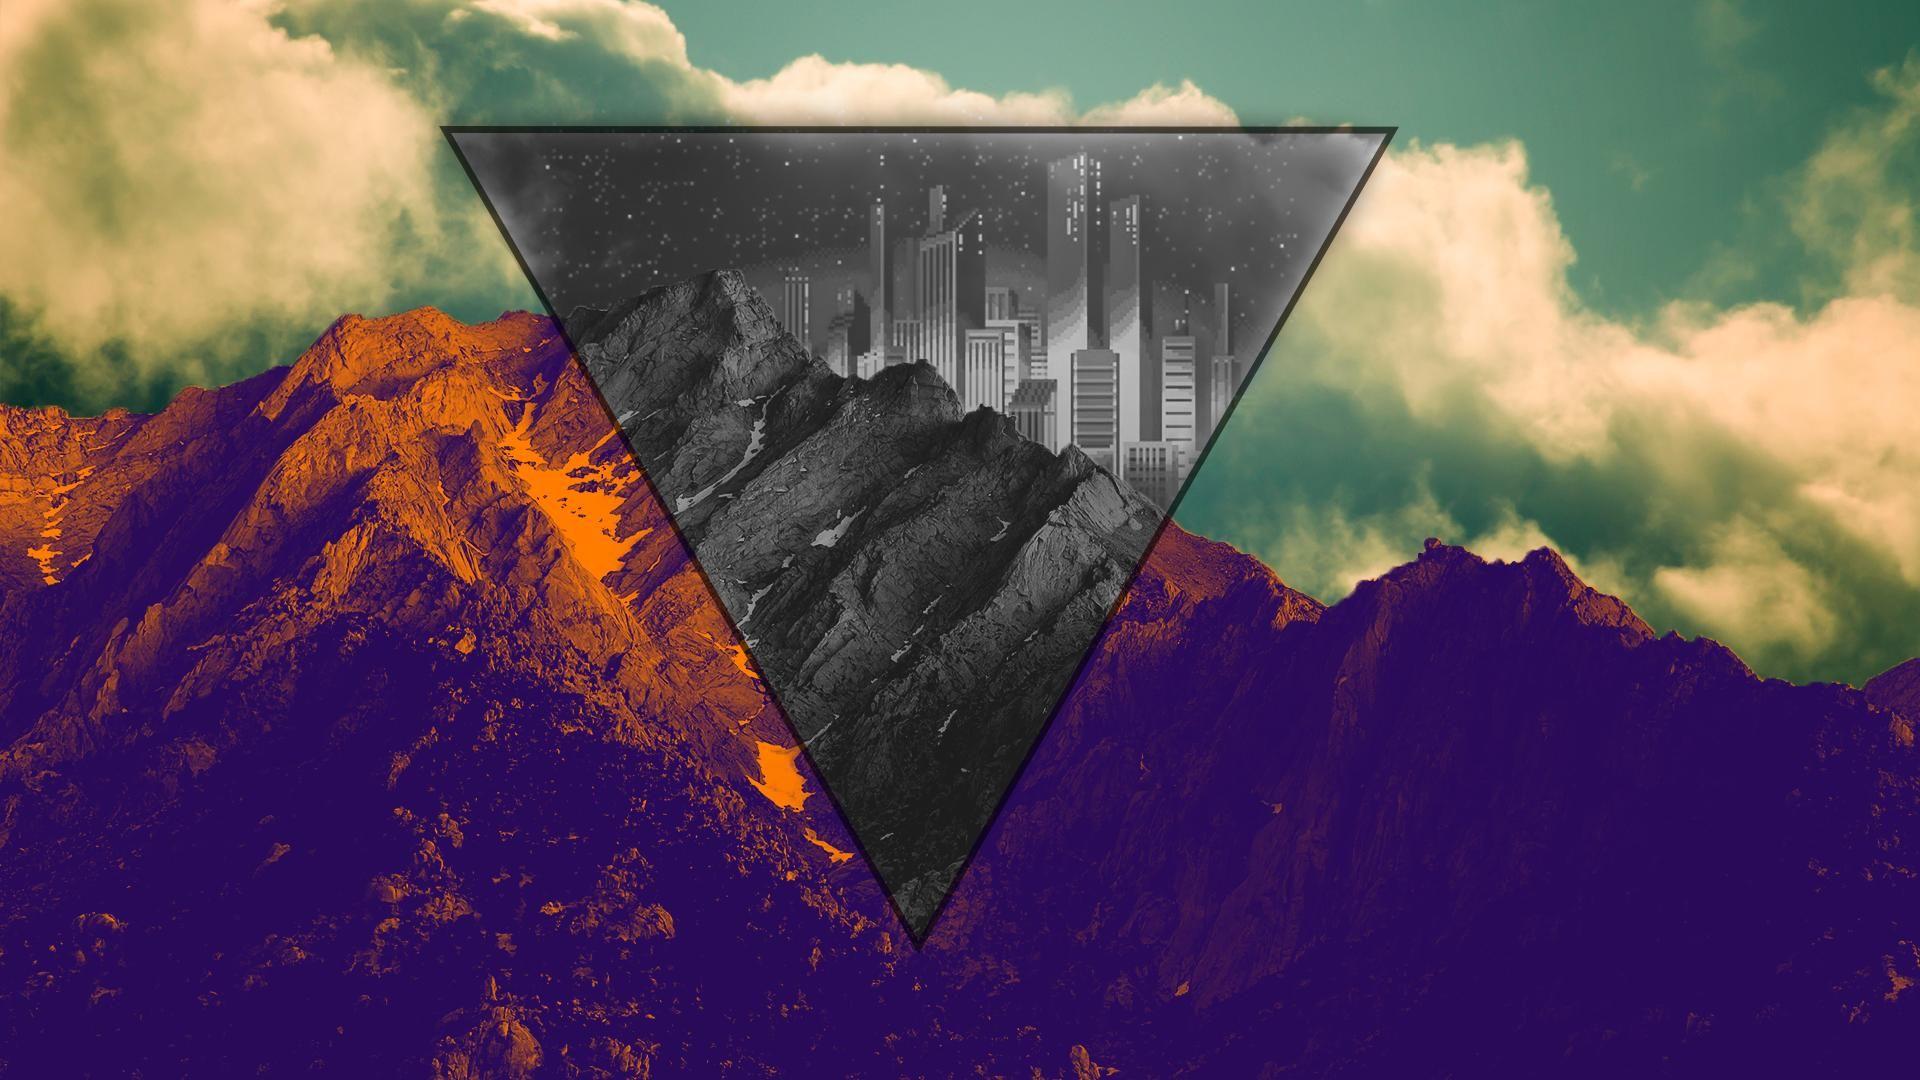 Mountain Wallpapers 4k